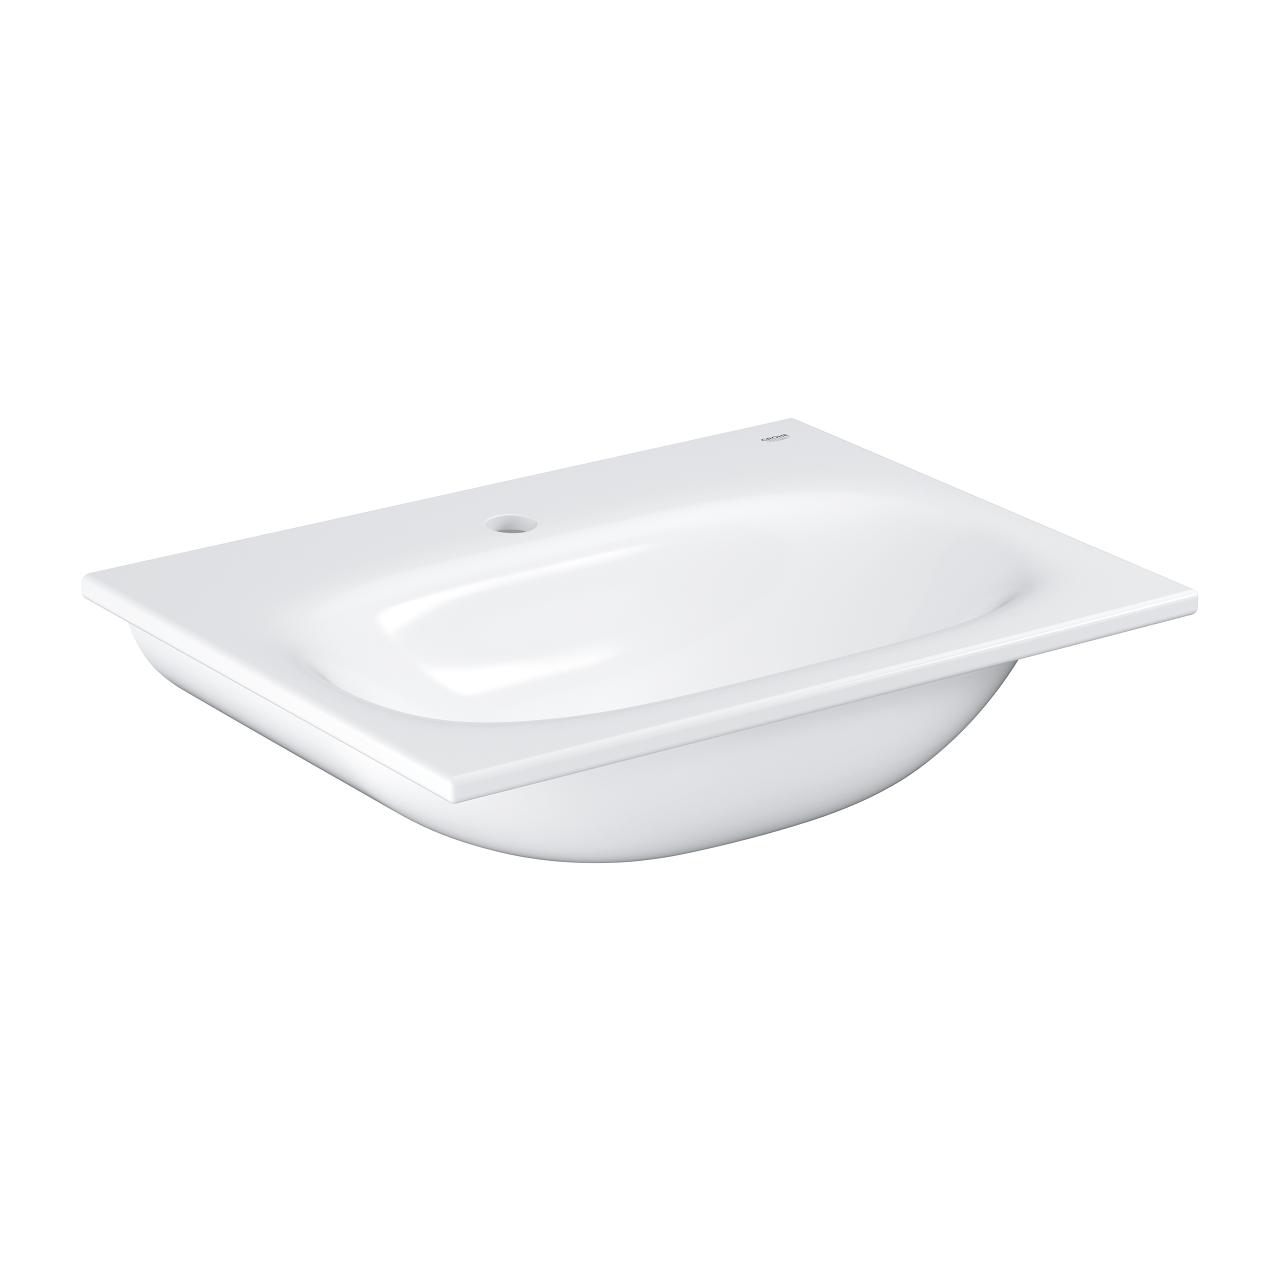 Grohe Essence - umywalka meblowa prostokątna 60x46 cm PureGuard biała 3956800H